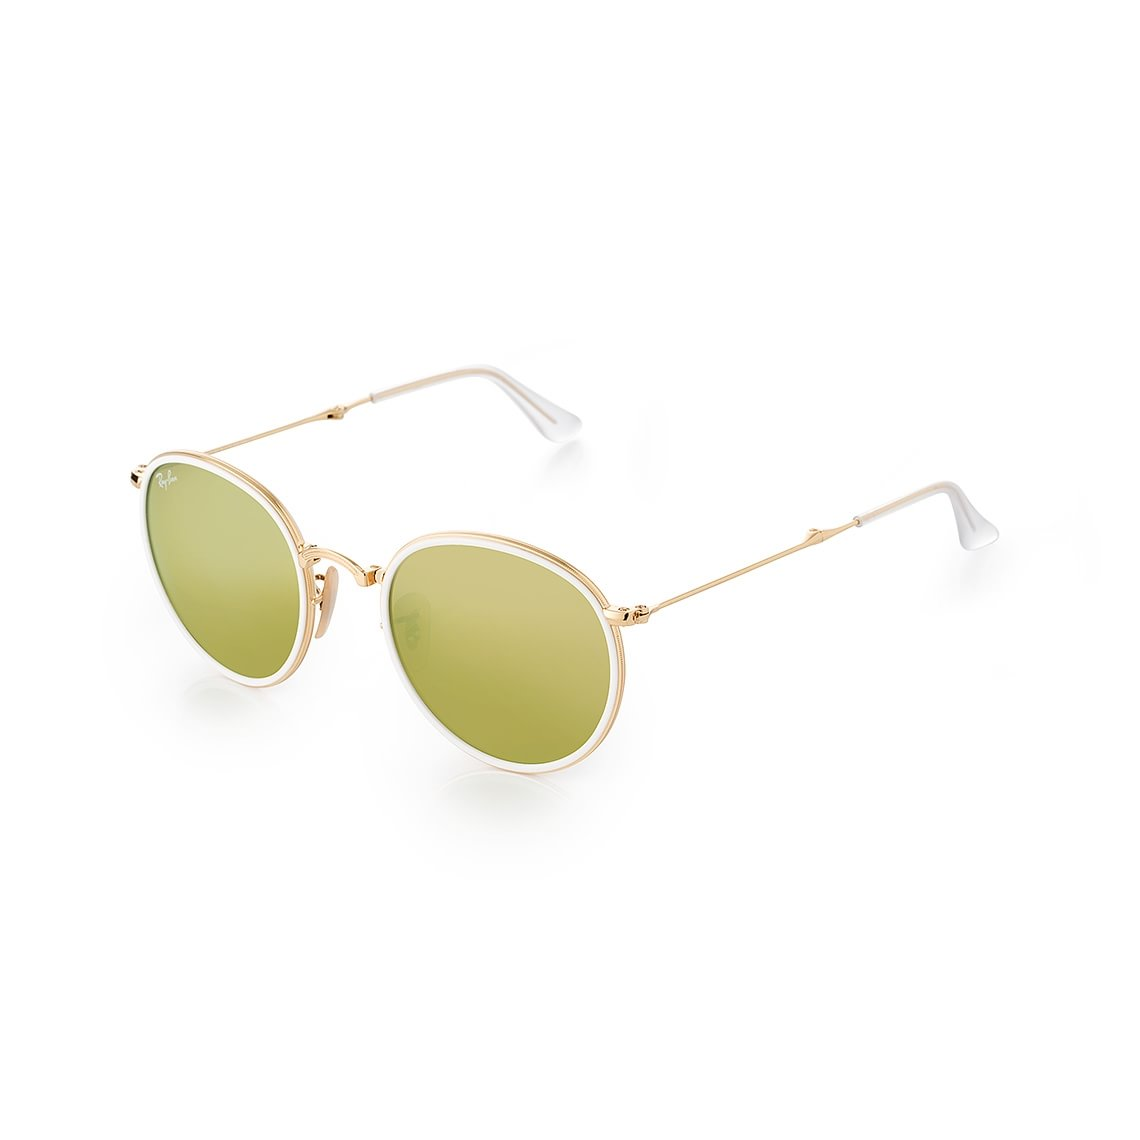 Ray-Ban - Solglasögon - Synsam 38a42774c0e9d